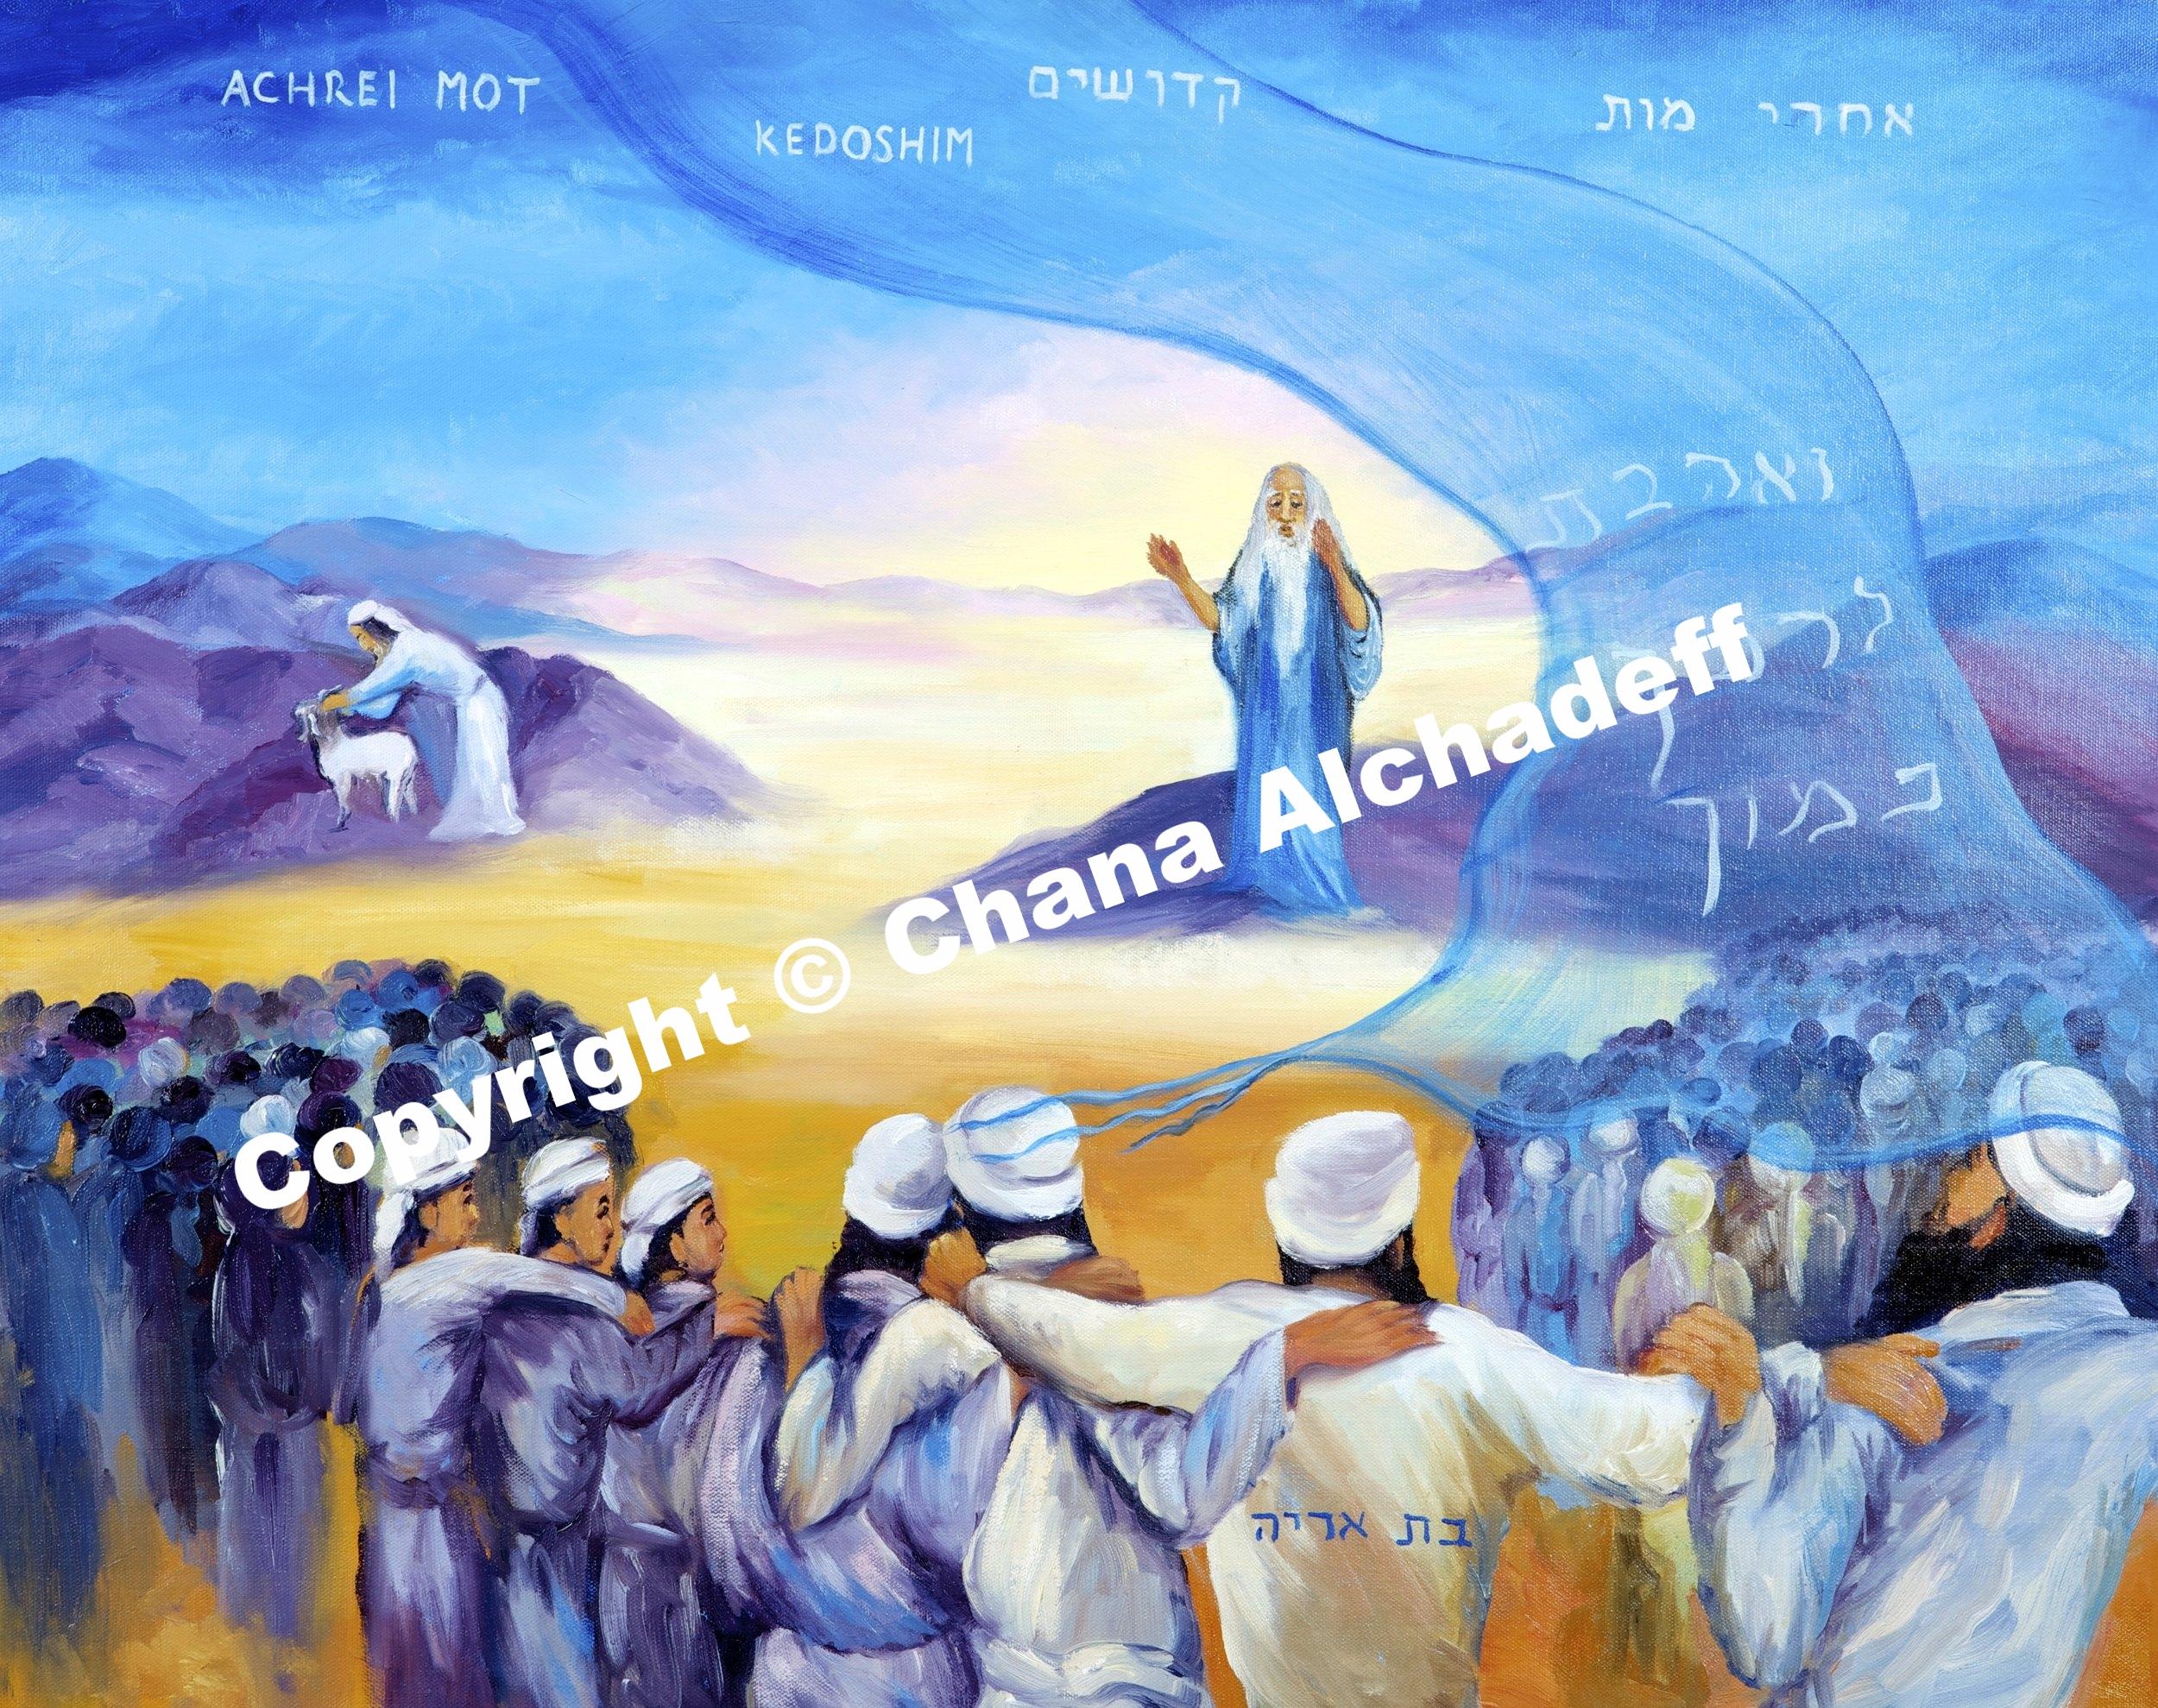 29-30 Acharei-Kedoshim